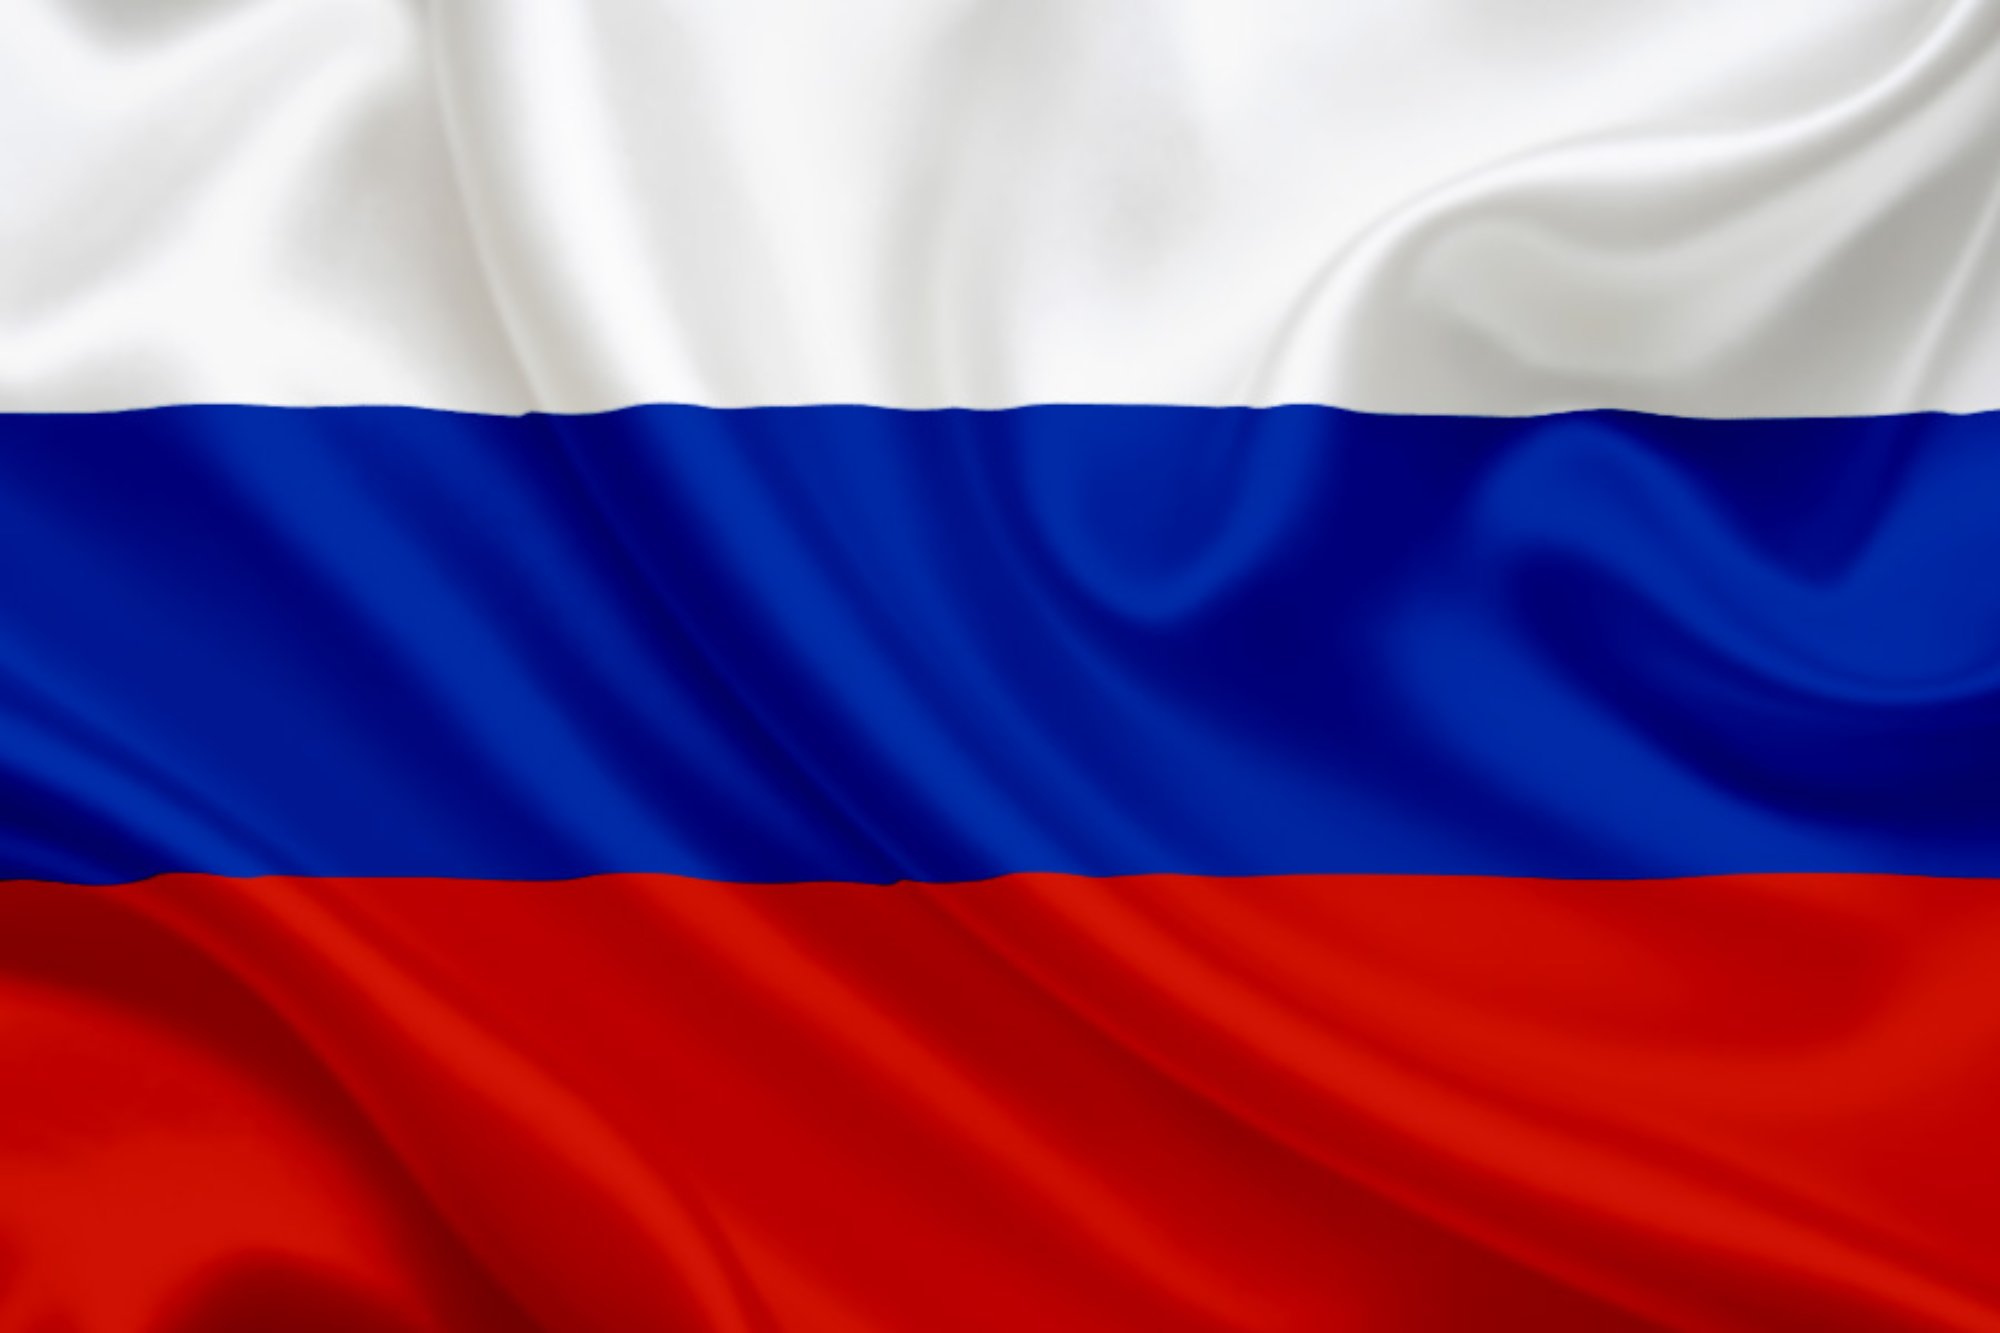 AWK TUTORIAL ?u=https%3A%2F%2Fwww.kcsgroup.com%2Fwp-content%2Fuploads%2F2017%2F05%2FRussian-Flag